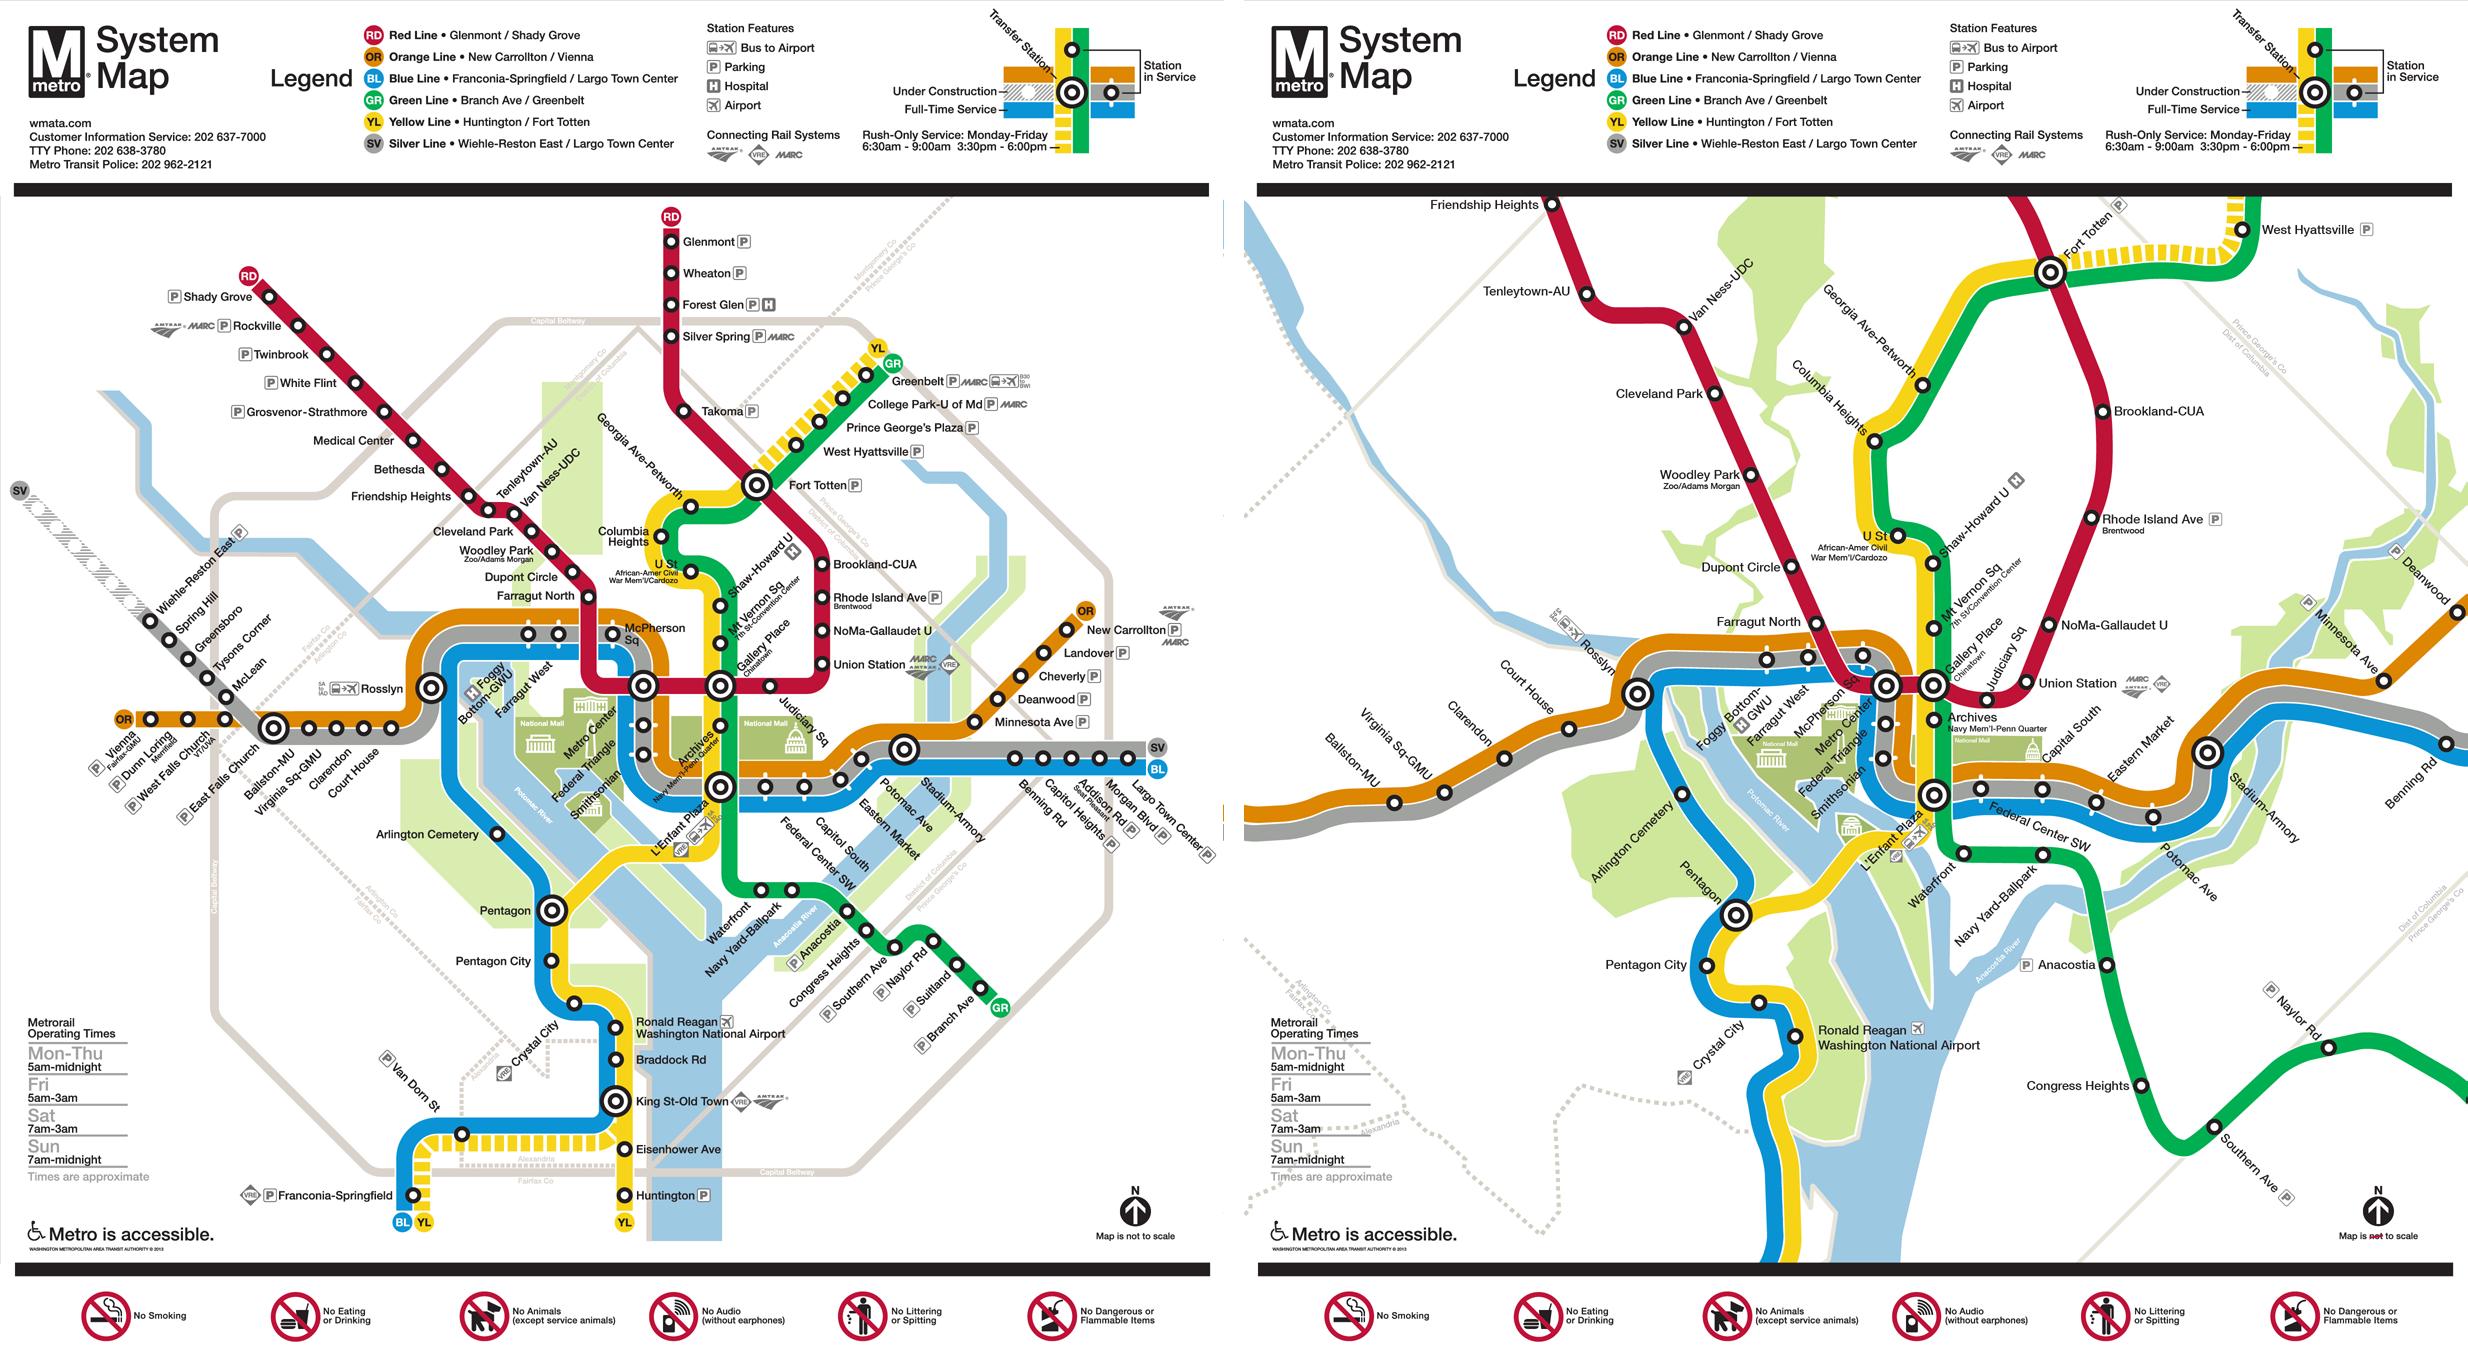 Washington Metro Map to Scale on Behance